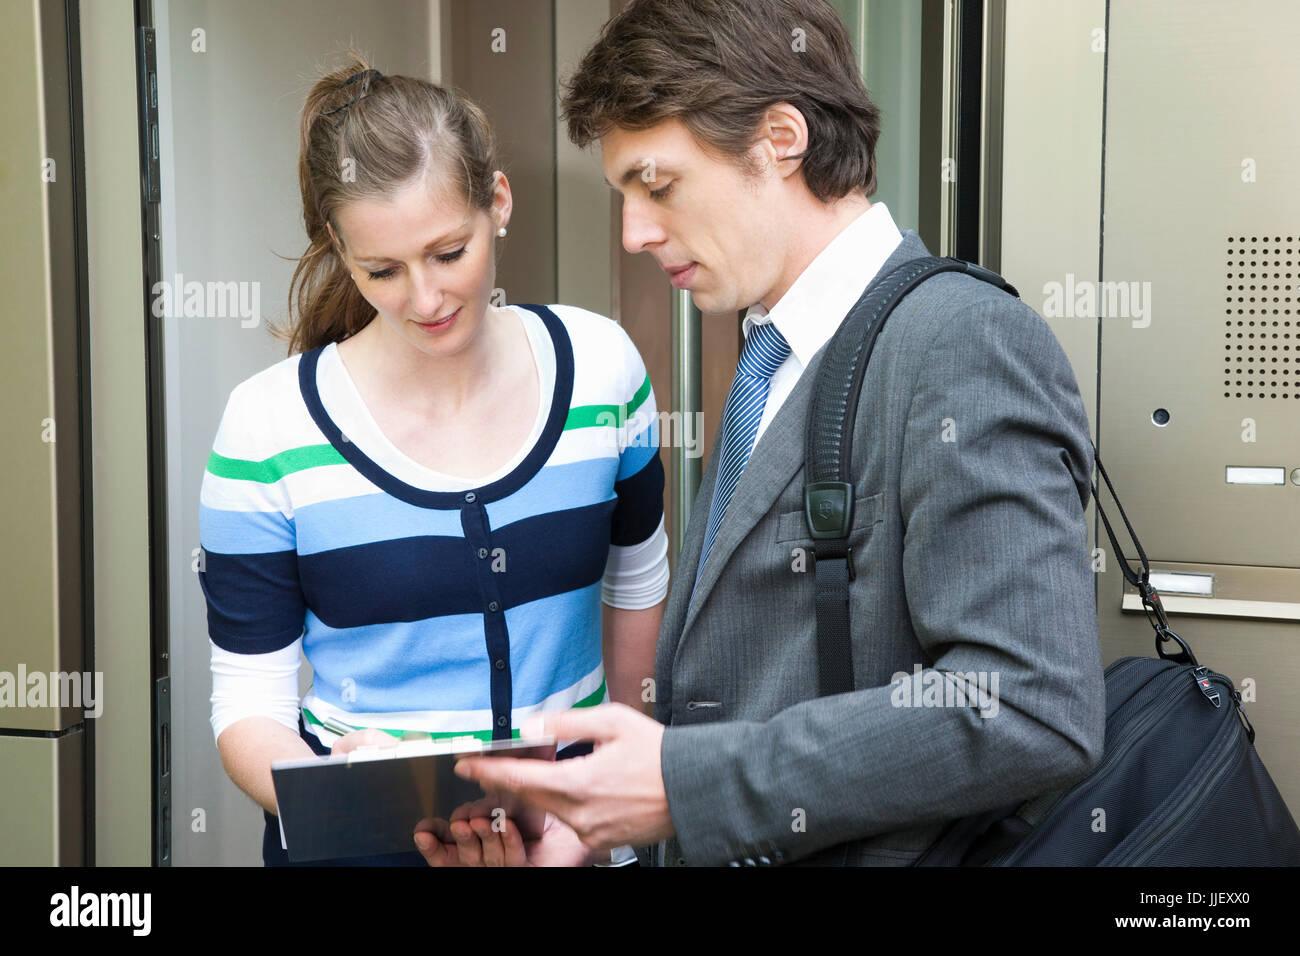 Woman with salesman on the doorstep - Stock Image